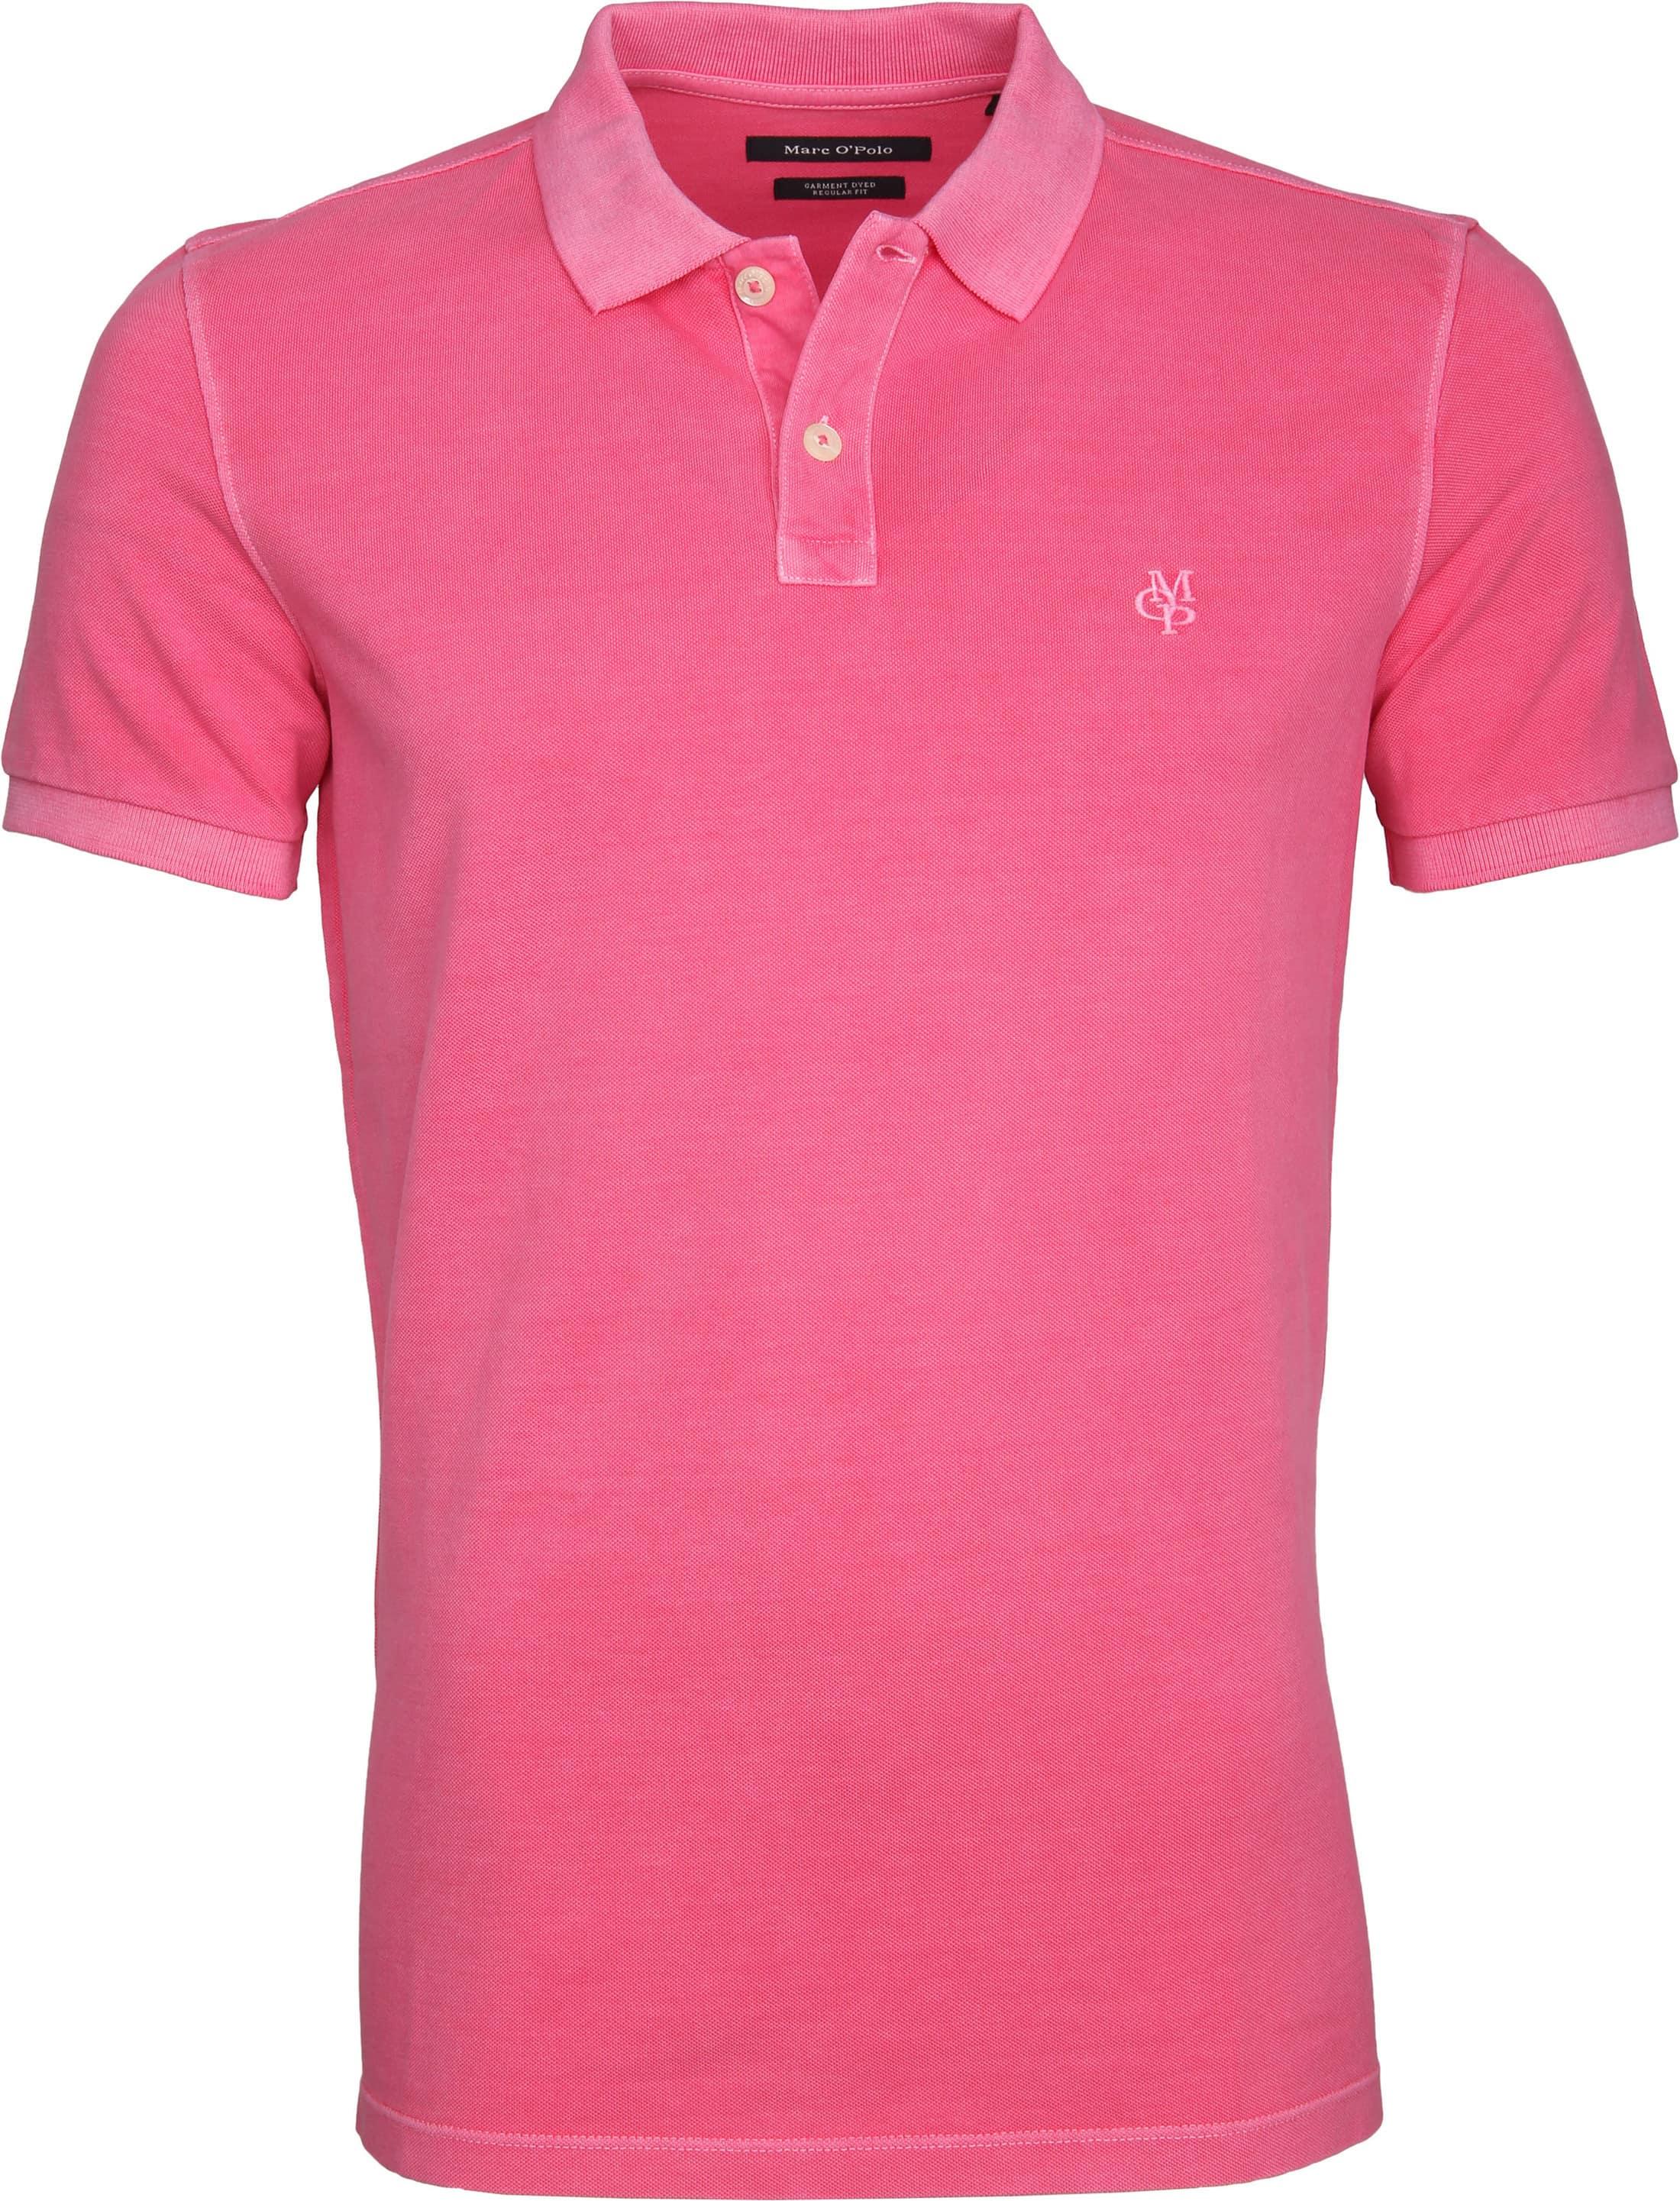 half off b2a60 6f73e Marc O'Polo Polo Garment Dyed Roze M22226653024 online ...